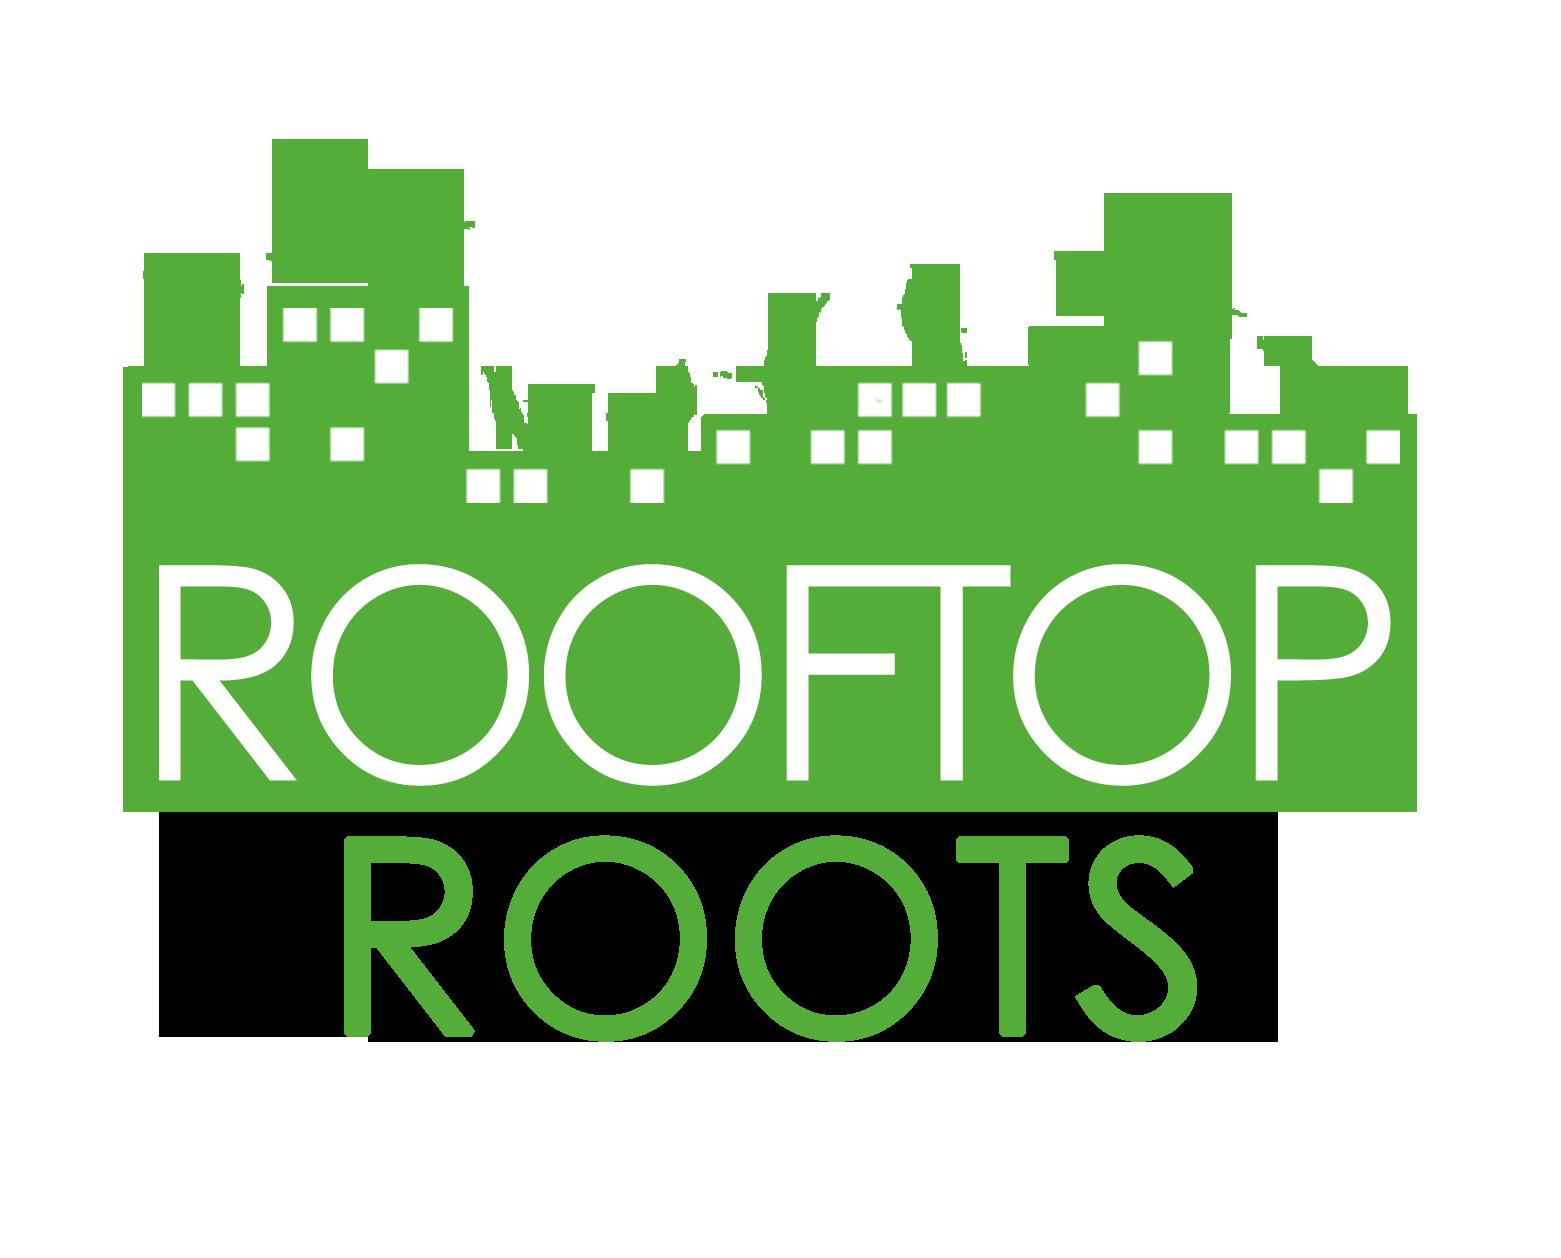 Rooftop Roots Logo By Anupam Chakravarty Via Postscript